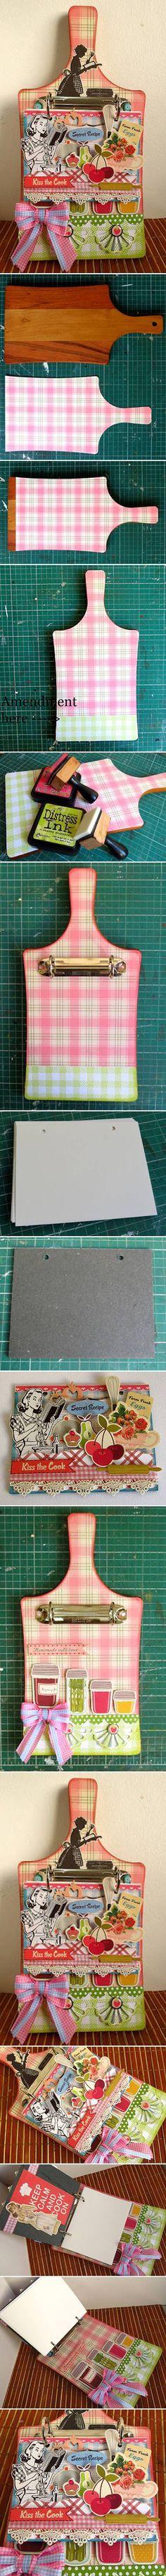 DIY Creative Handmade Cookbook DIY Projects | UsefulDIY.com Follow Us on Facebook == http://www.facebook.com/UsefulDiy